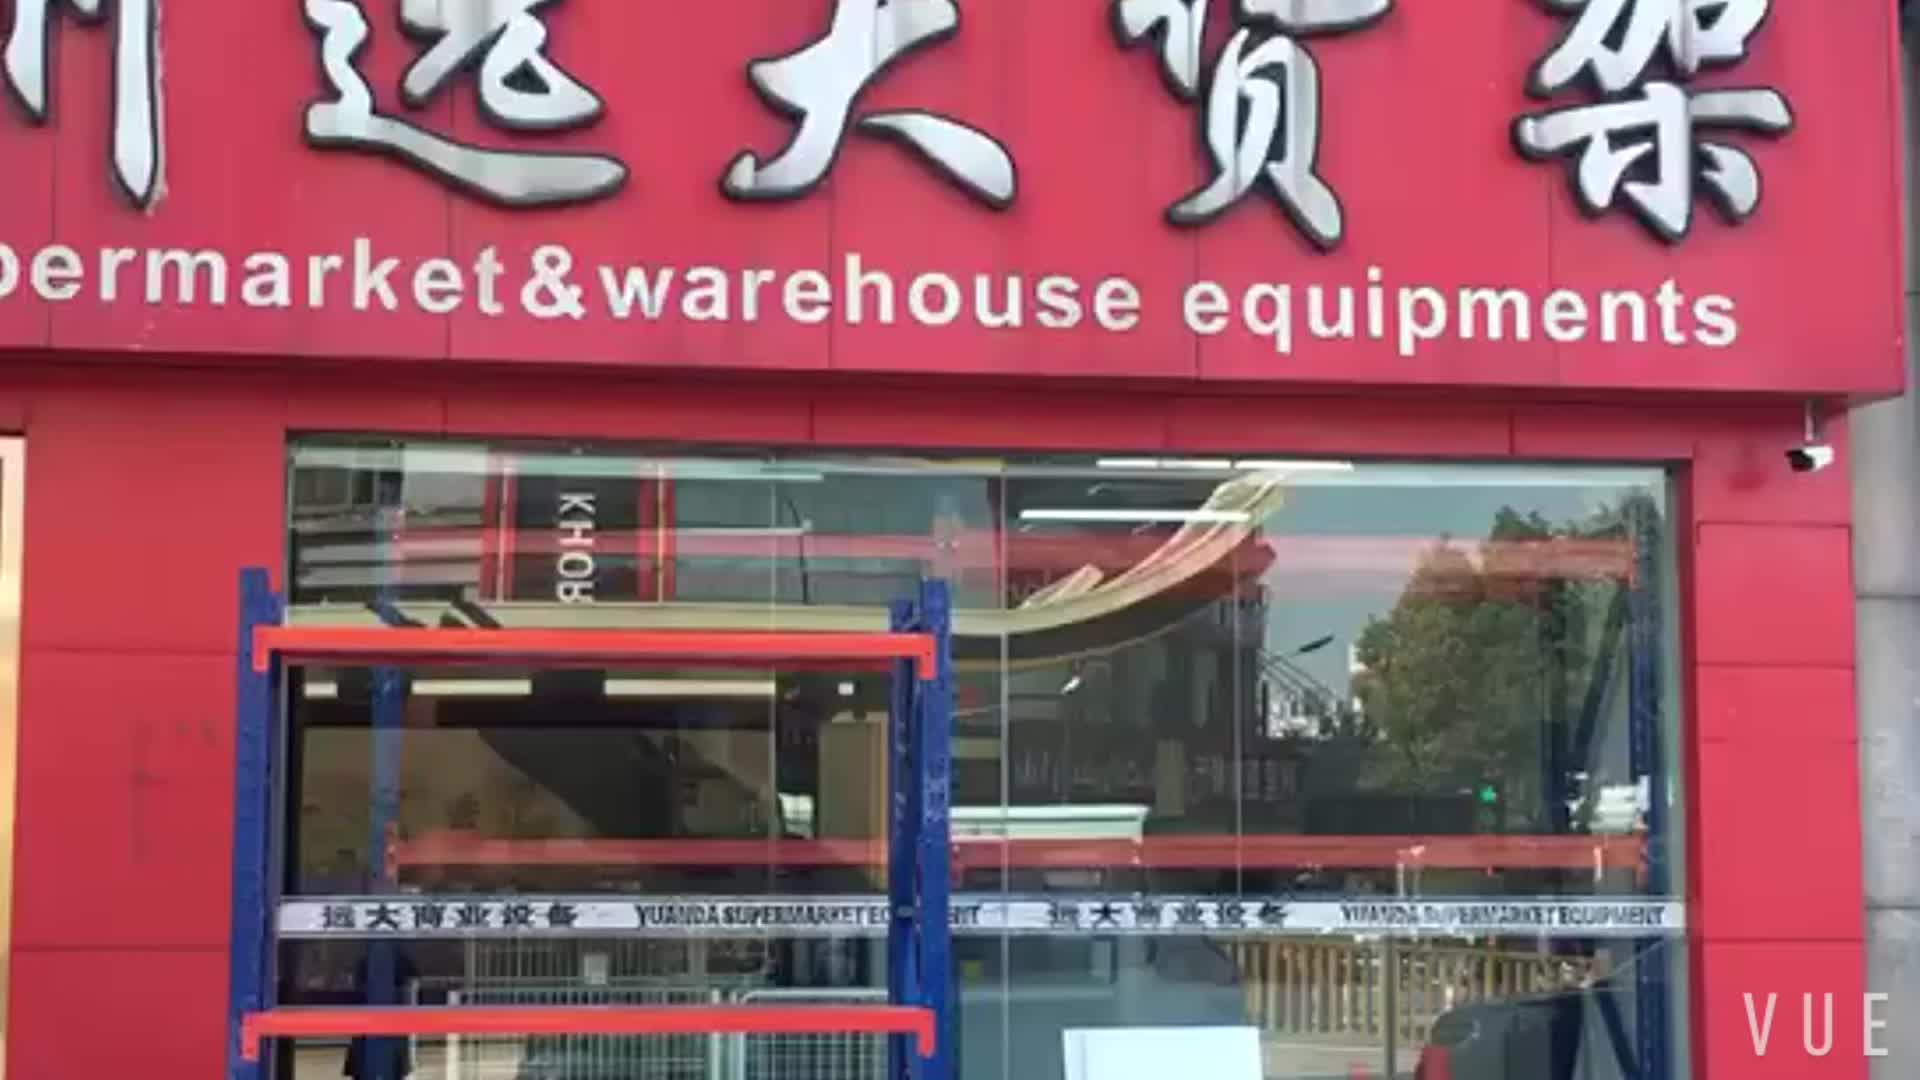 Warehouse storage racking system shelves for market metal rack